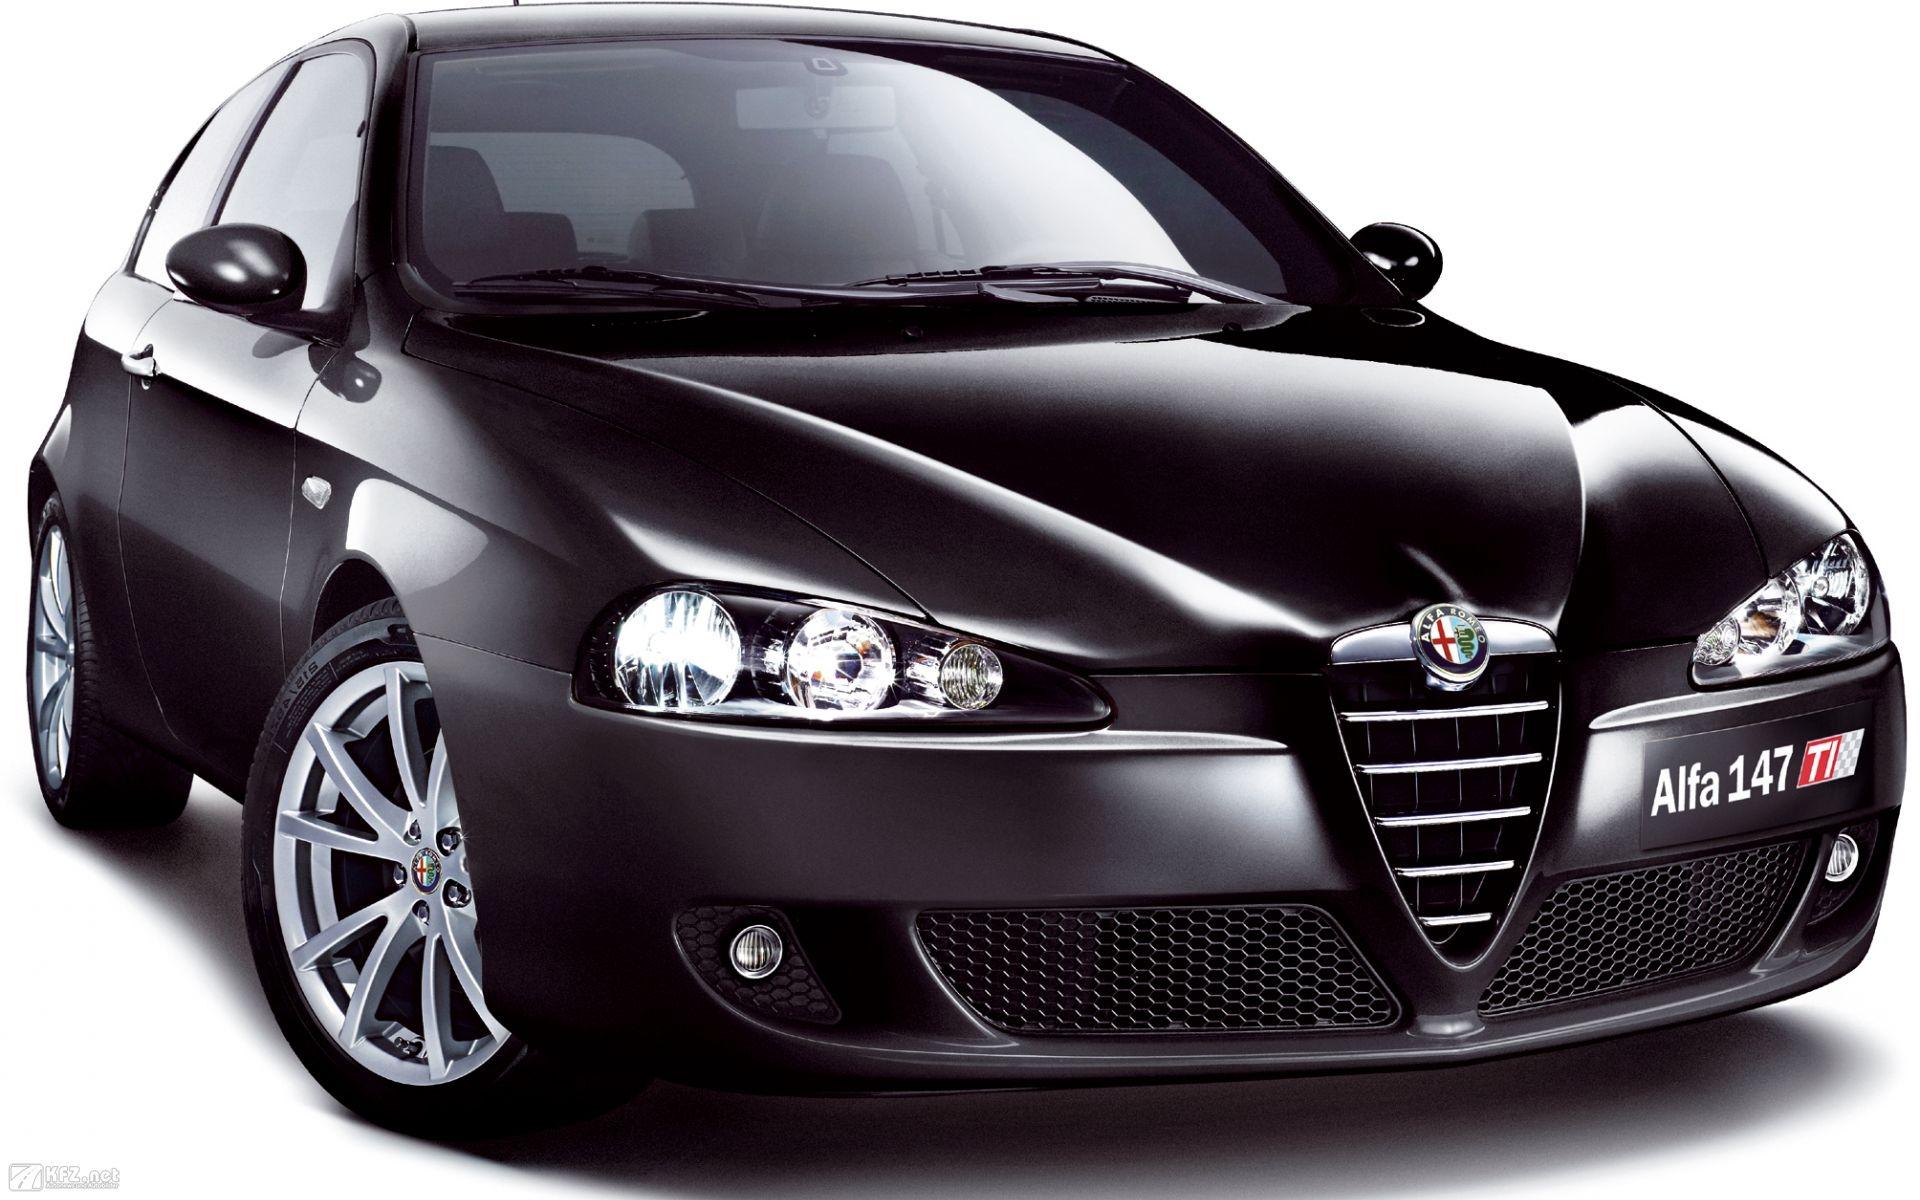 Freni pattini Alfa Romeo 147